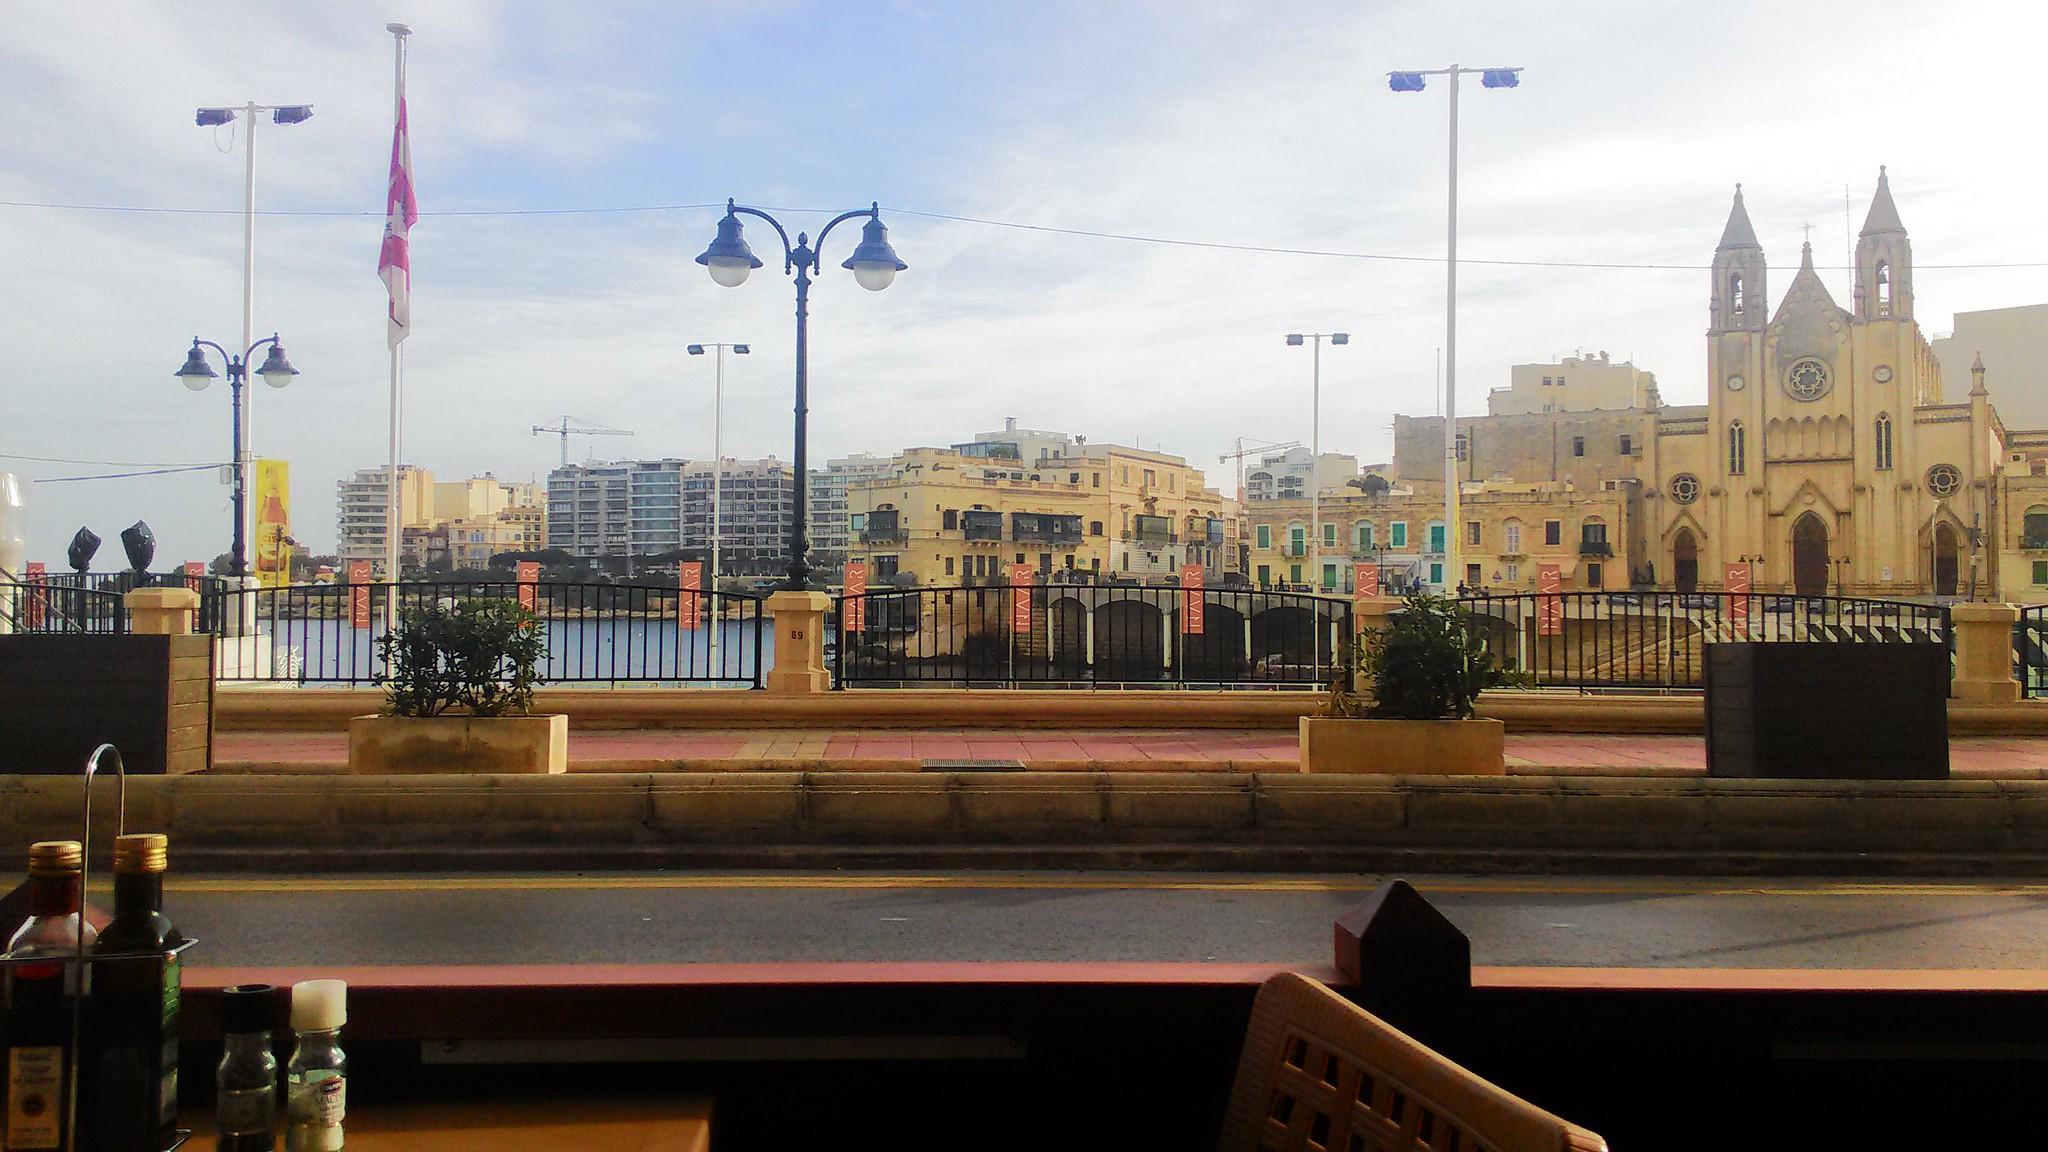 Vista dal Cafè sotto l'Hotel - St Julians Bay